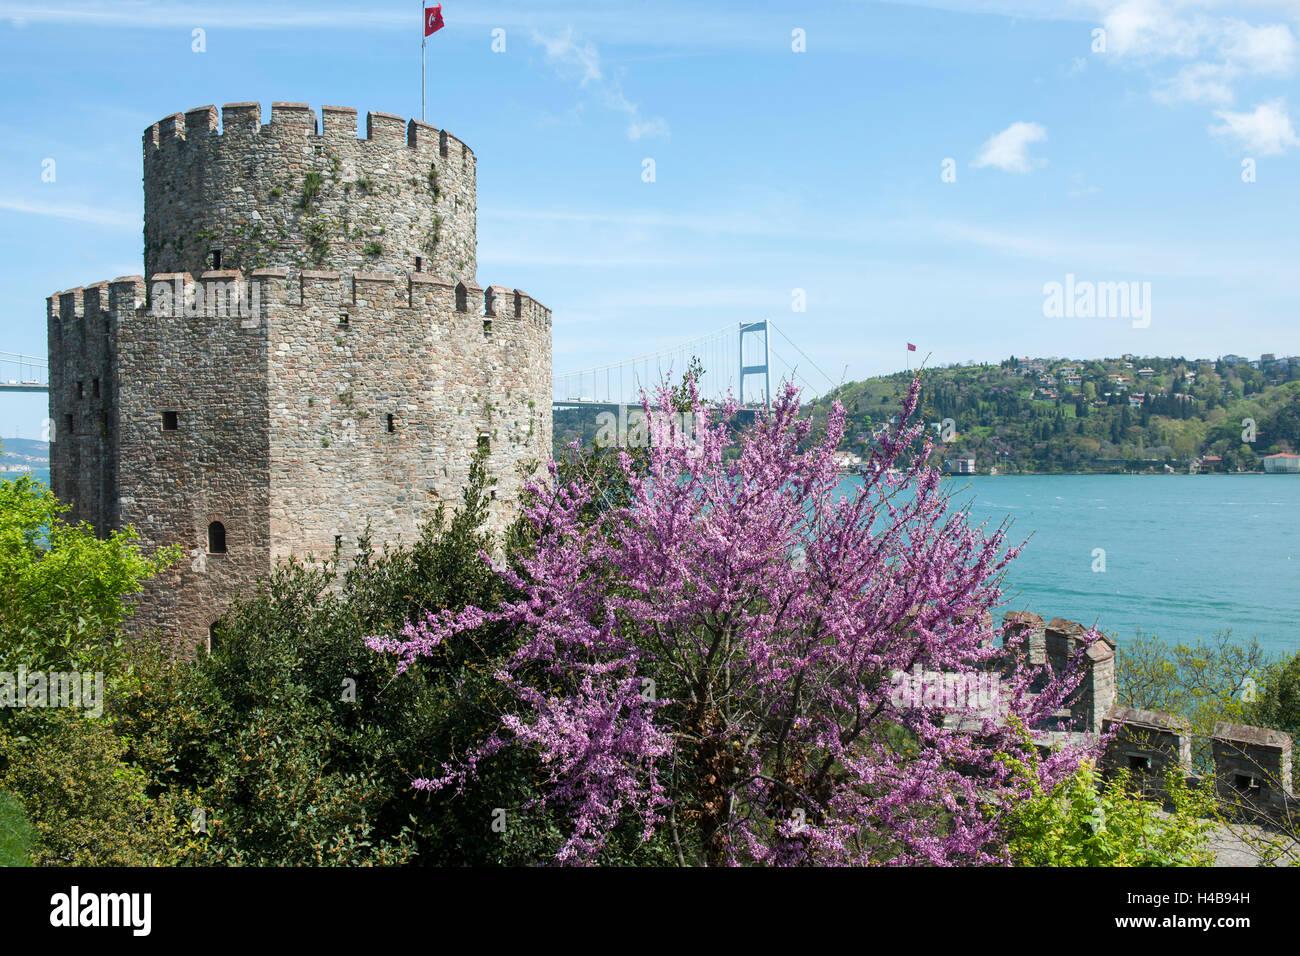 Istanbul, Sariyer, Rumelihisar, in the spring blossom the Judas trees Stock Photo